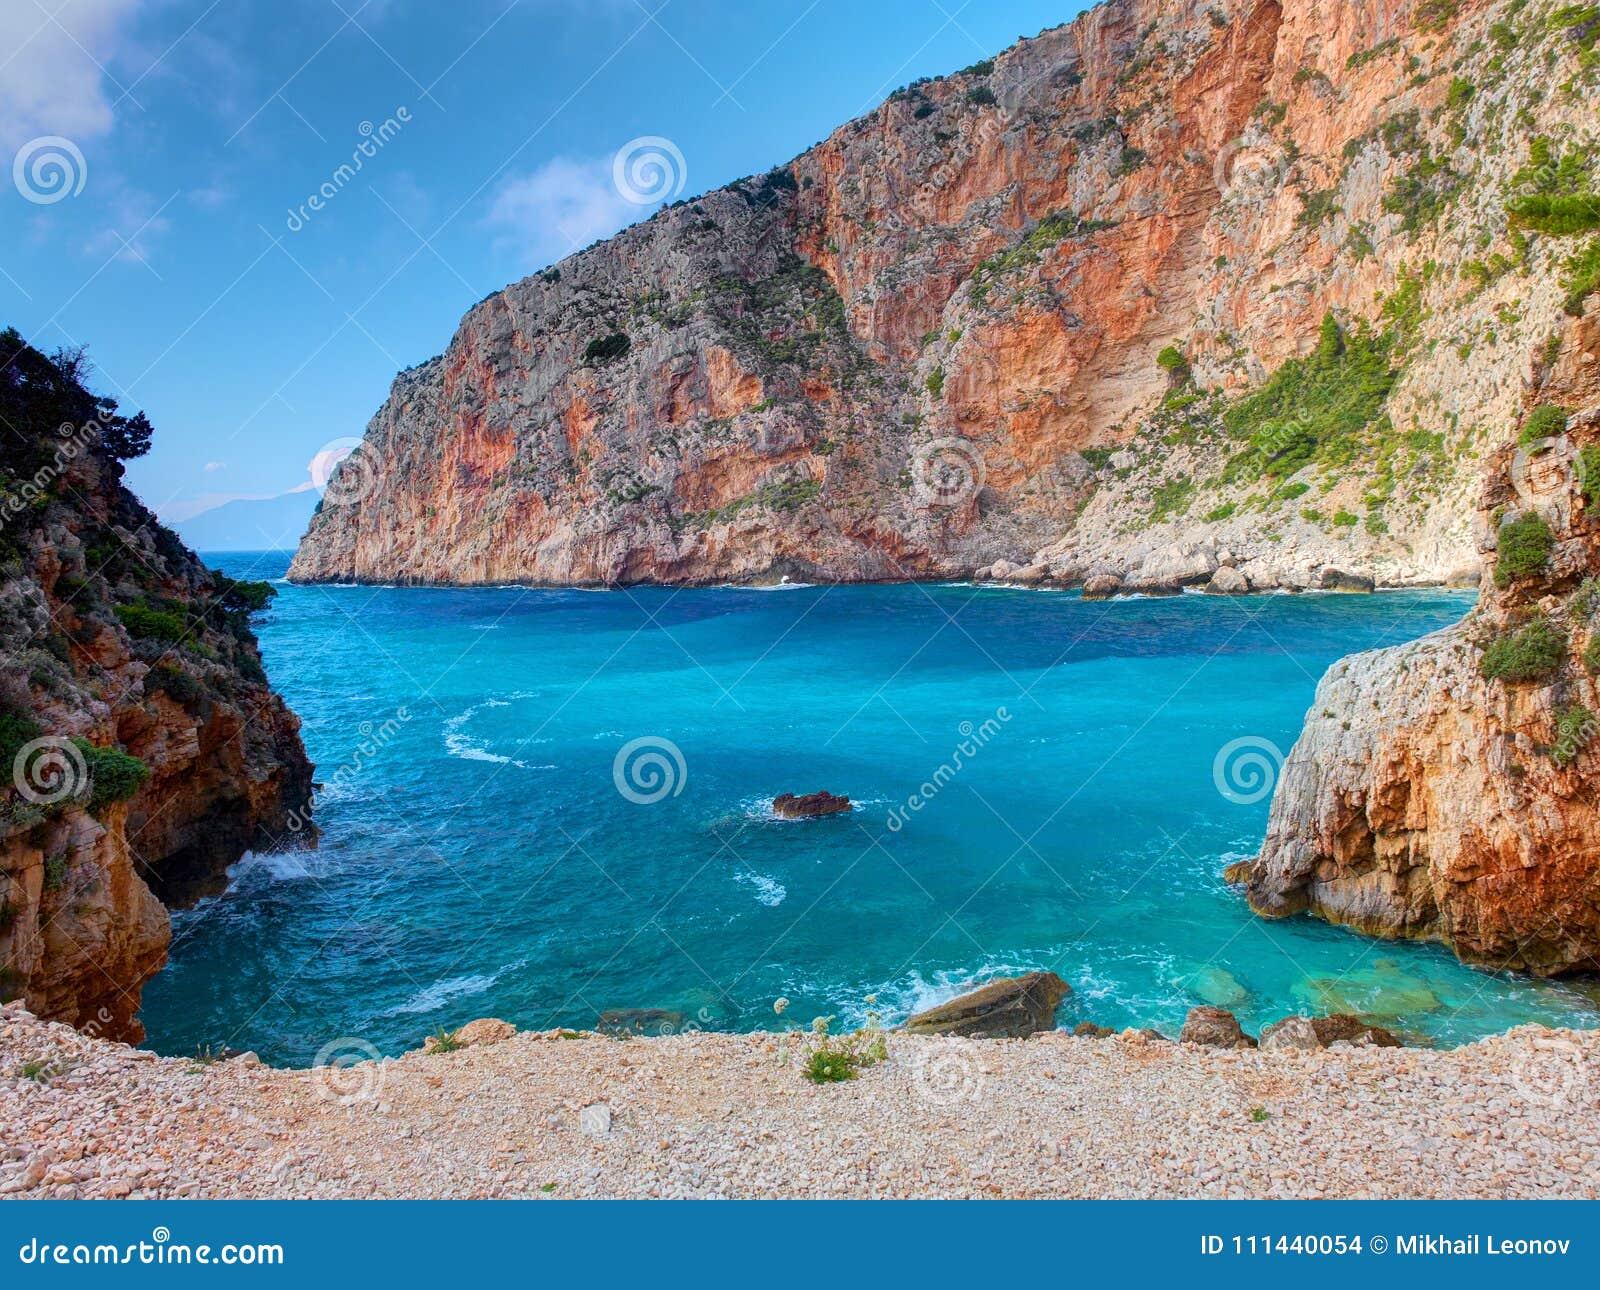 Navagio beach Zakynthos - Ship wreck beach - Griekenland.net | 1065x1300